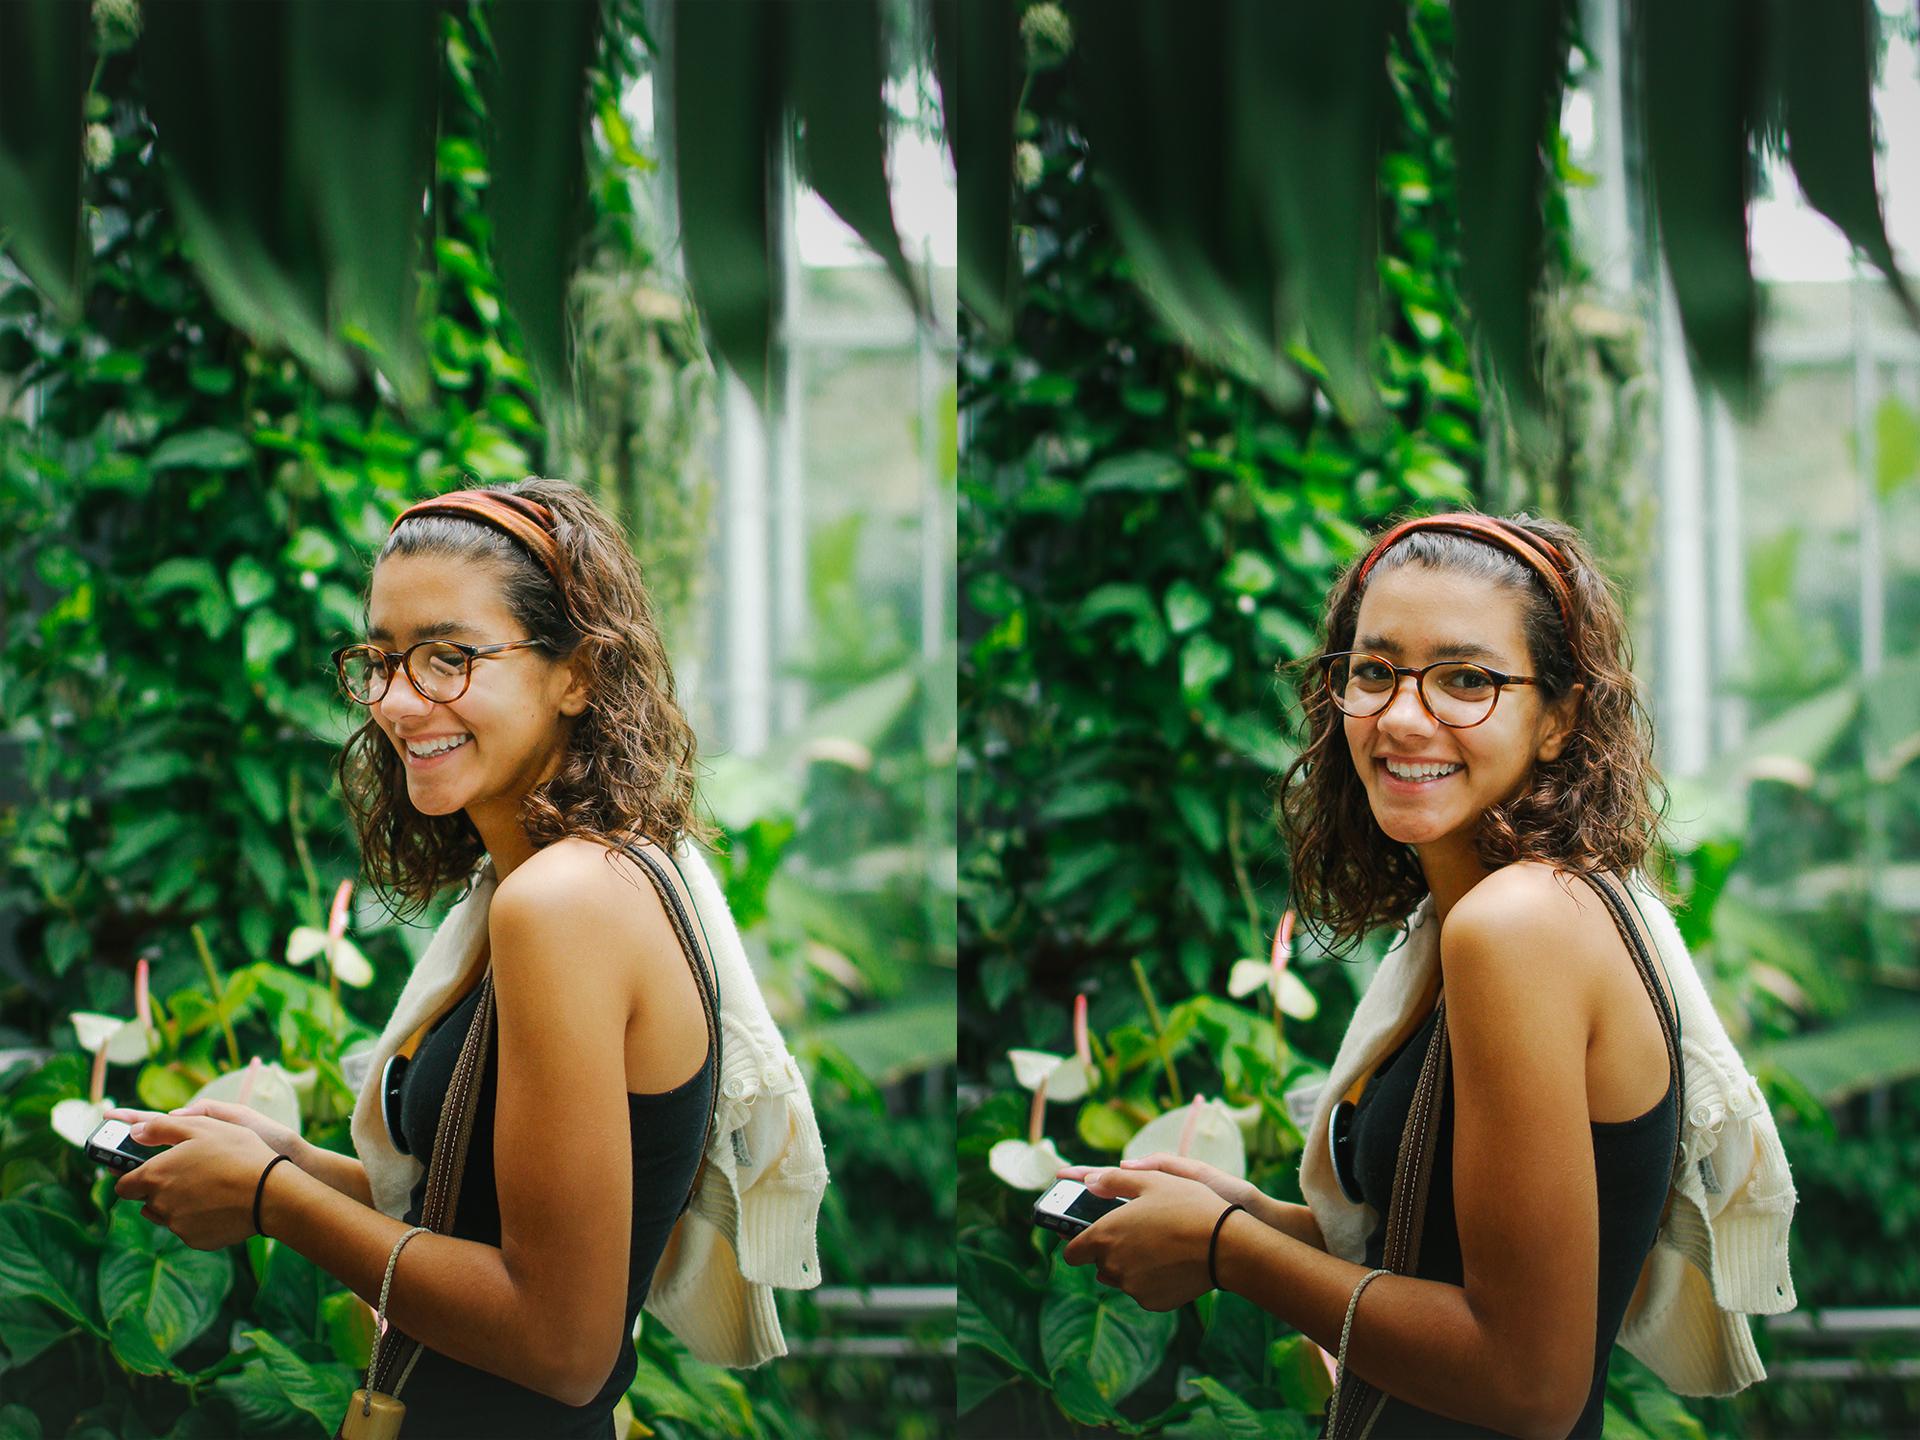 portraits in botanical gardens.jpg